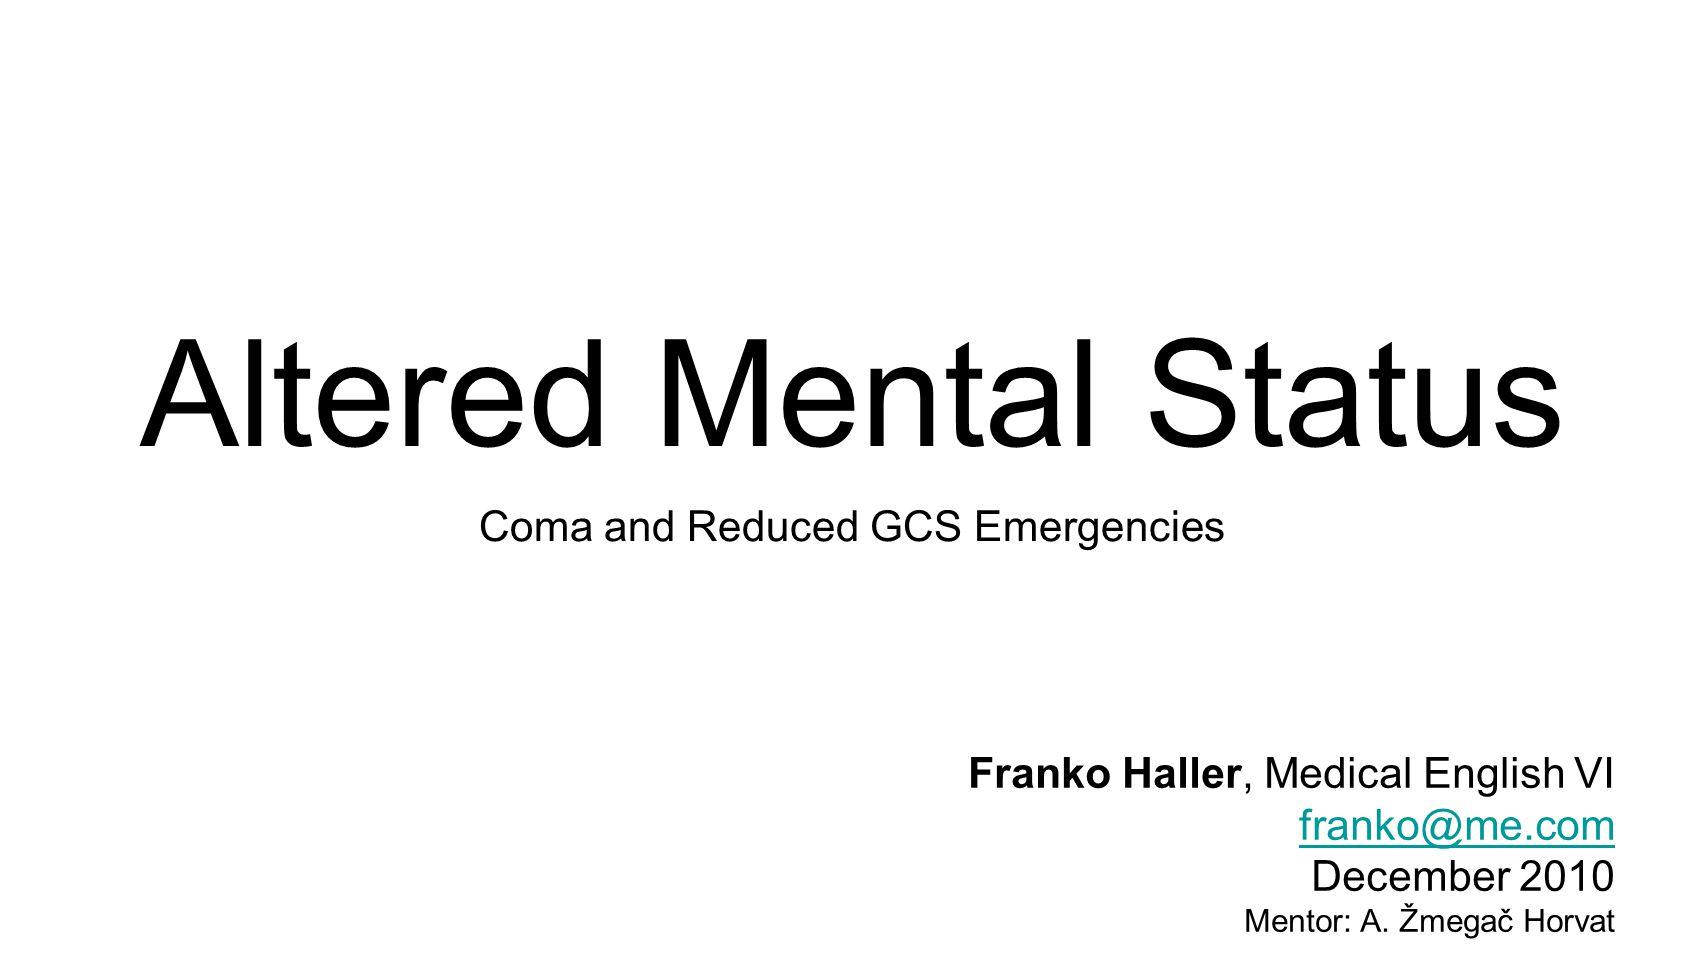 Altered Mental Status Coma and Reduced GCS Emergencies Franko Haller, Medical English VI franko@me.com December 2010 Mentor: A.